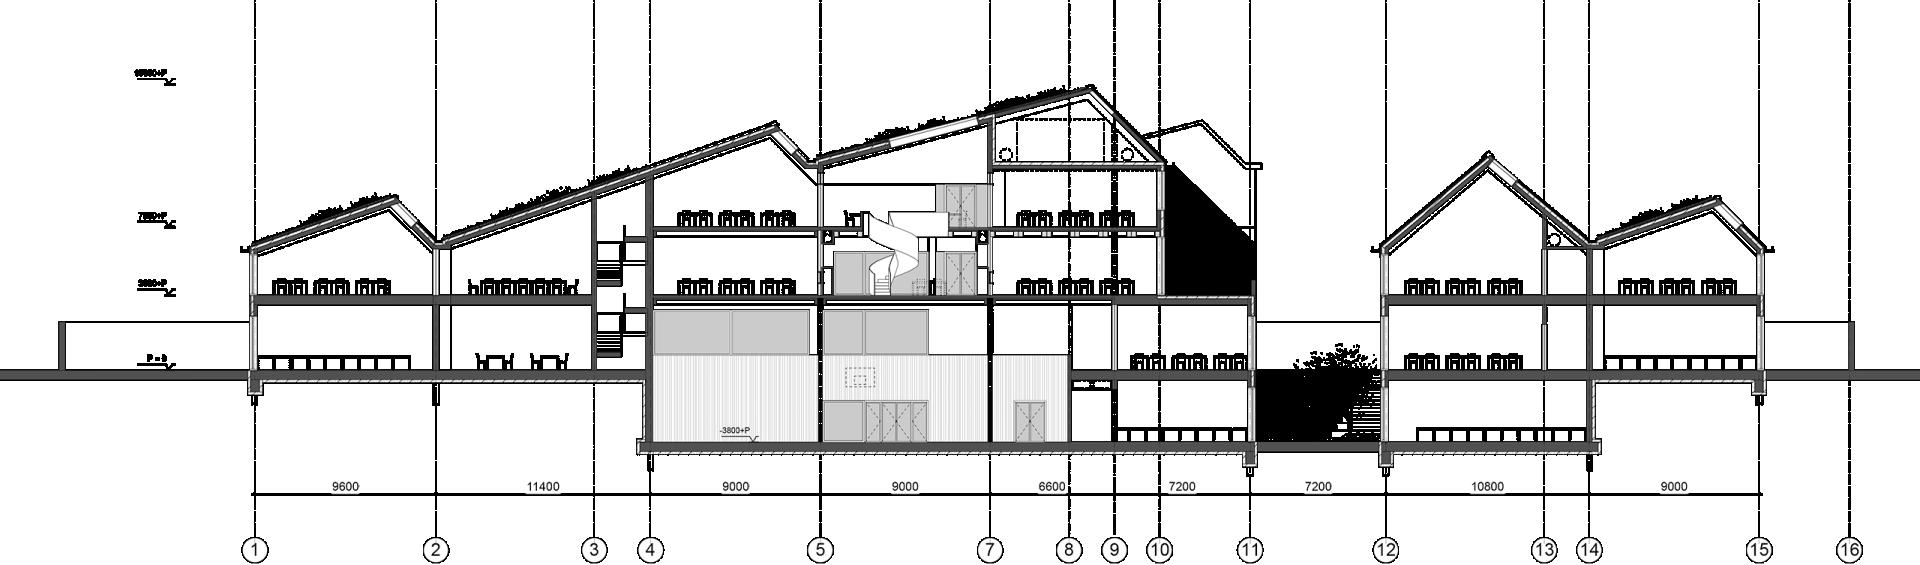 Lakbors Section